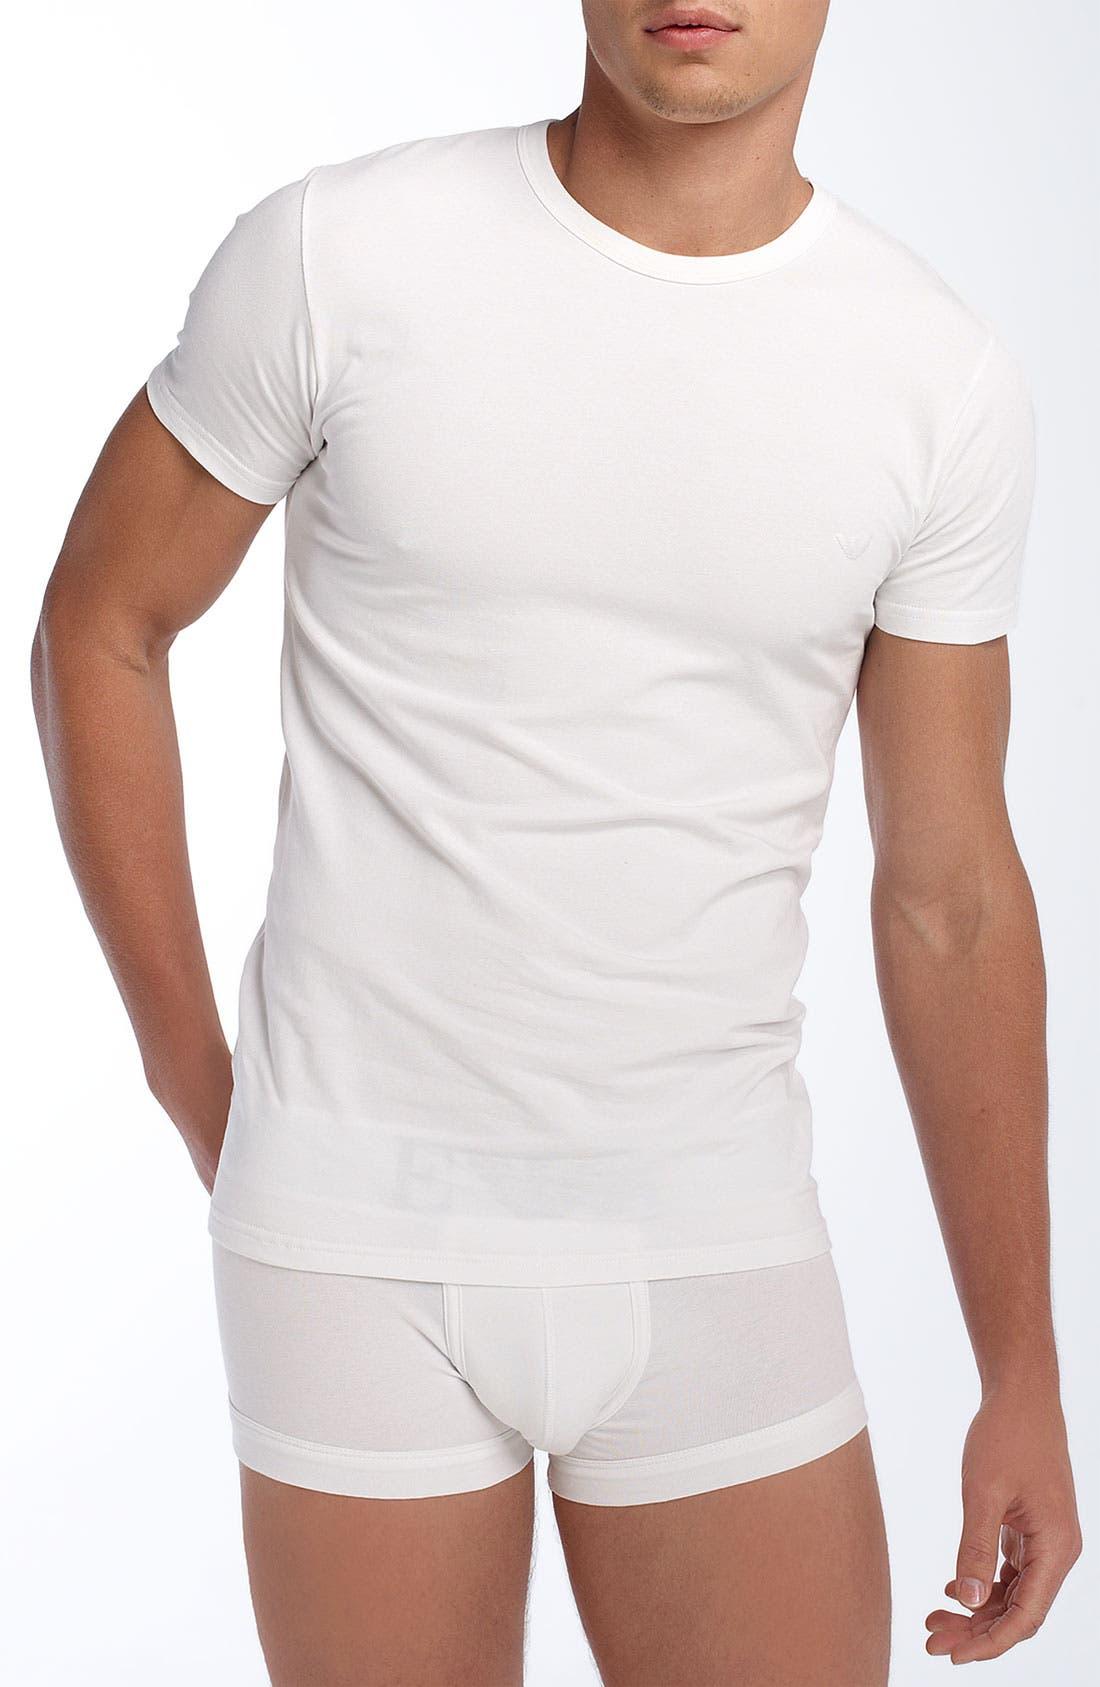 Main Image - Emporio Armani Crewneck Cotton T-Shirt